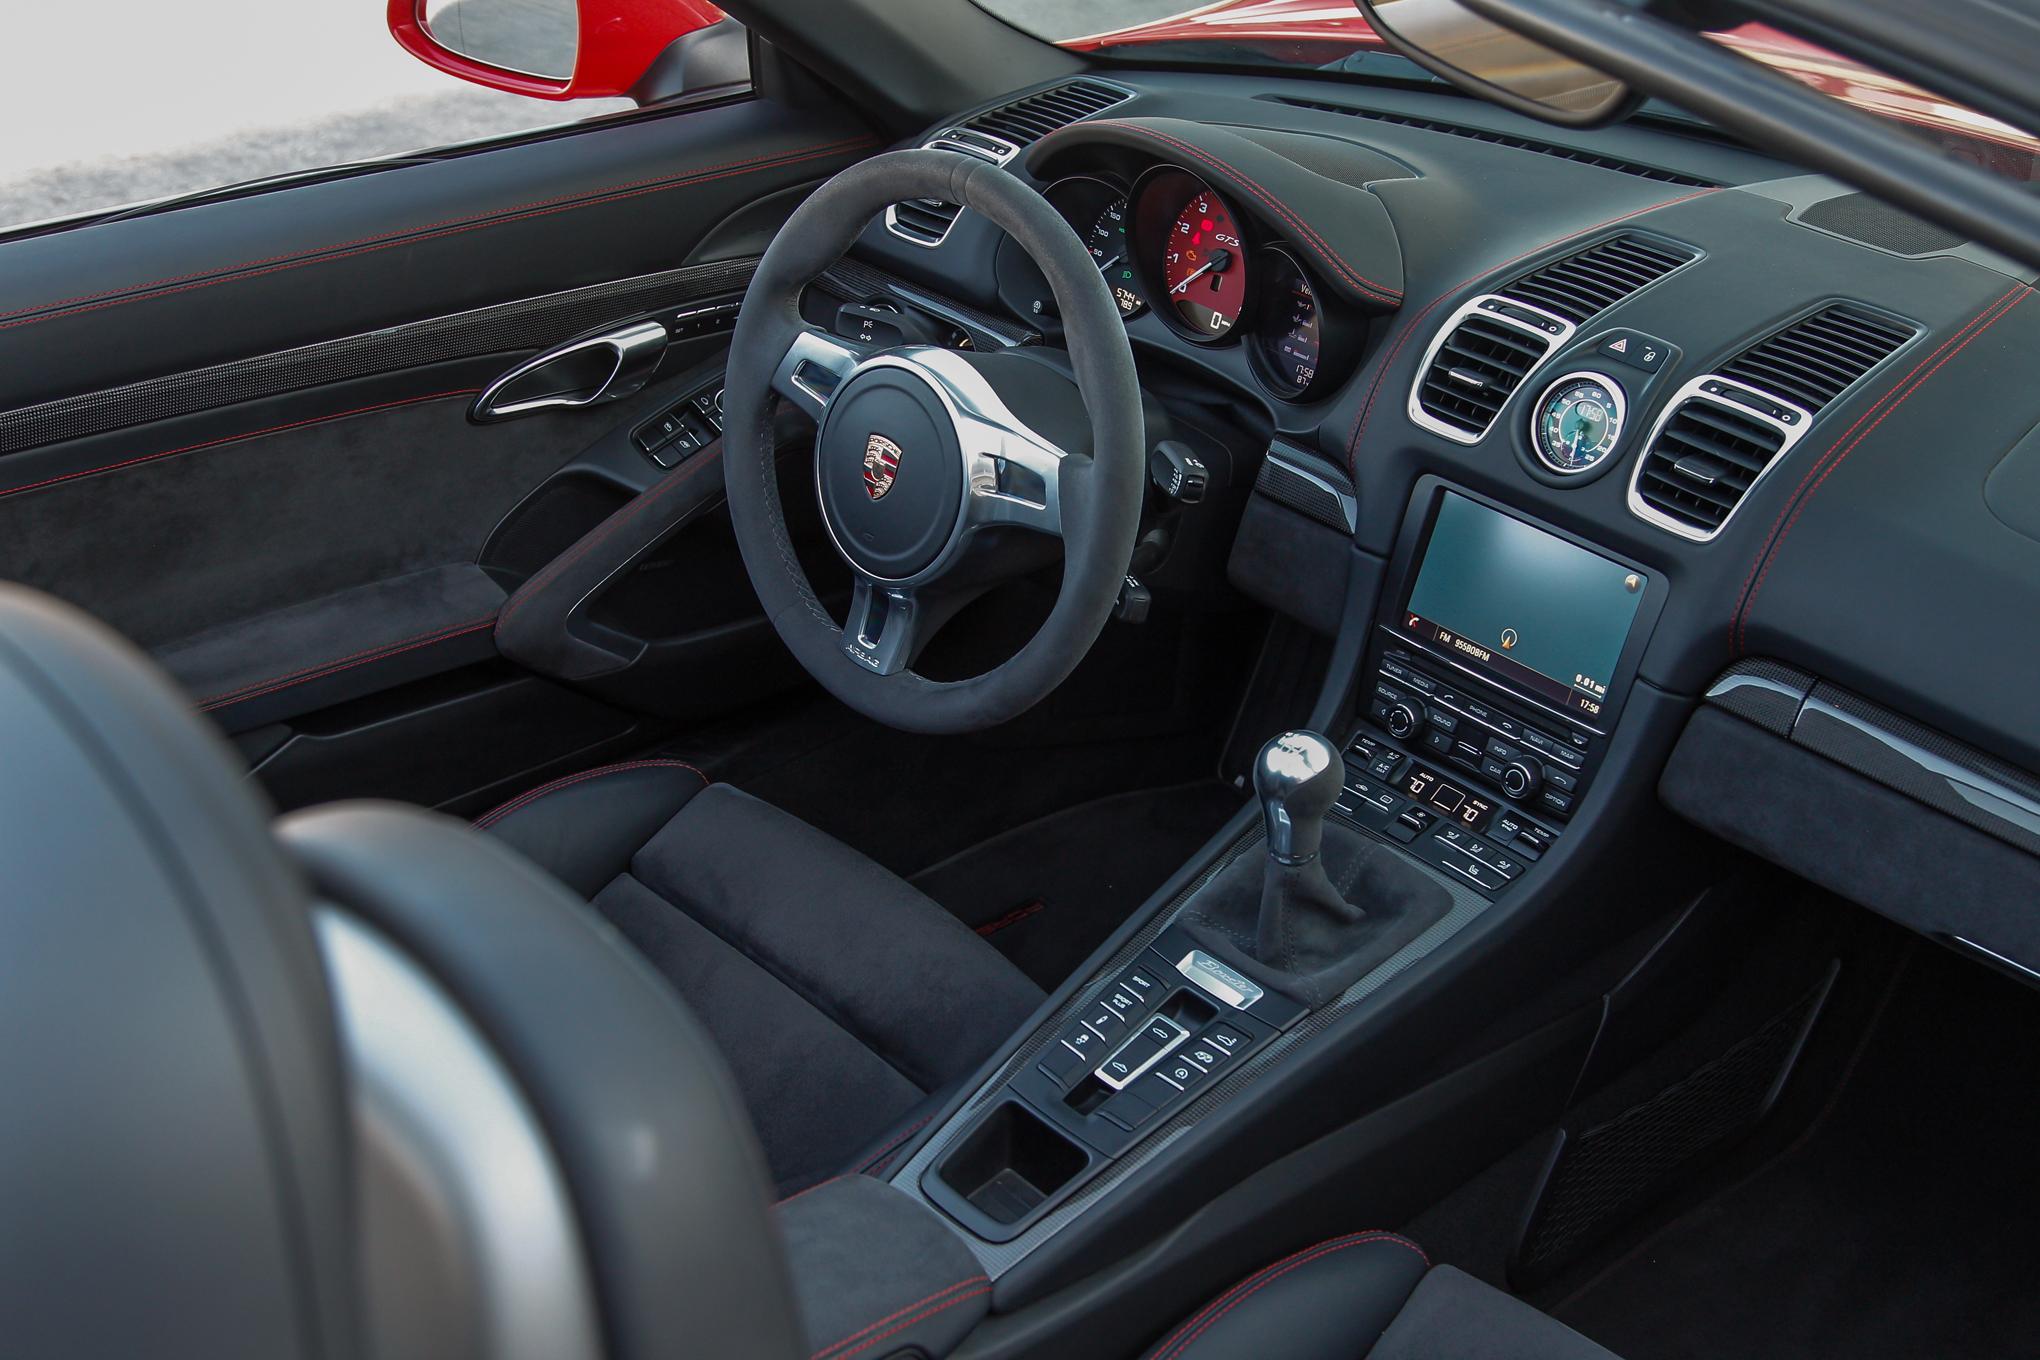 2015 Porsche Boxster GTS Dashboard